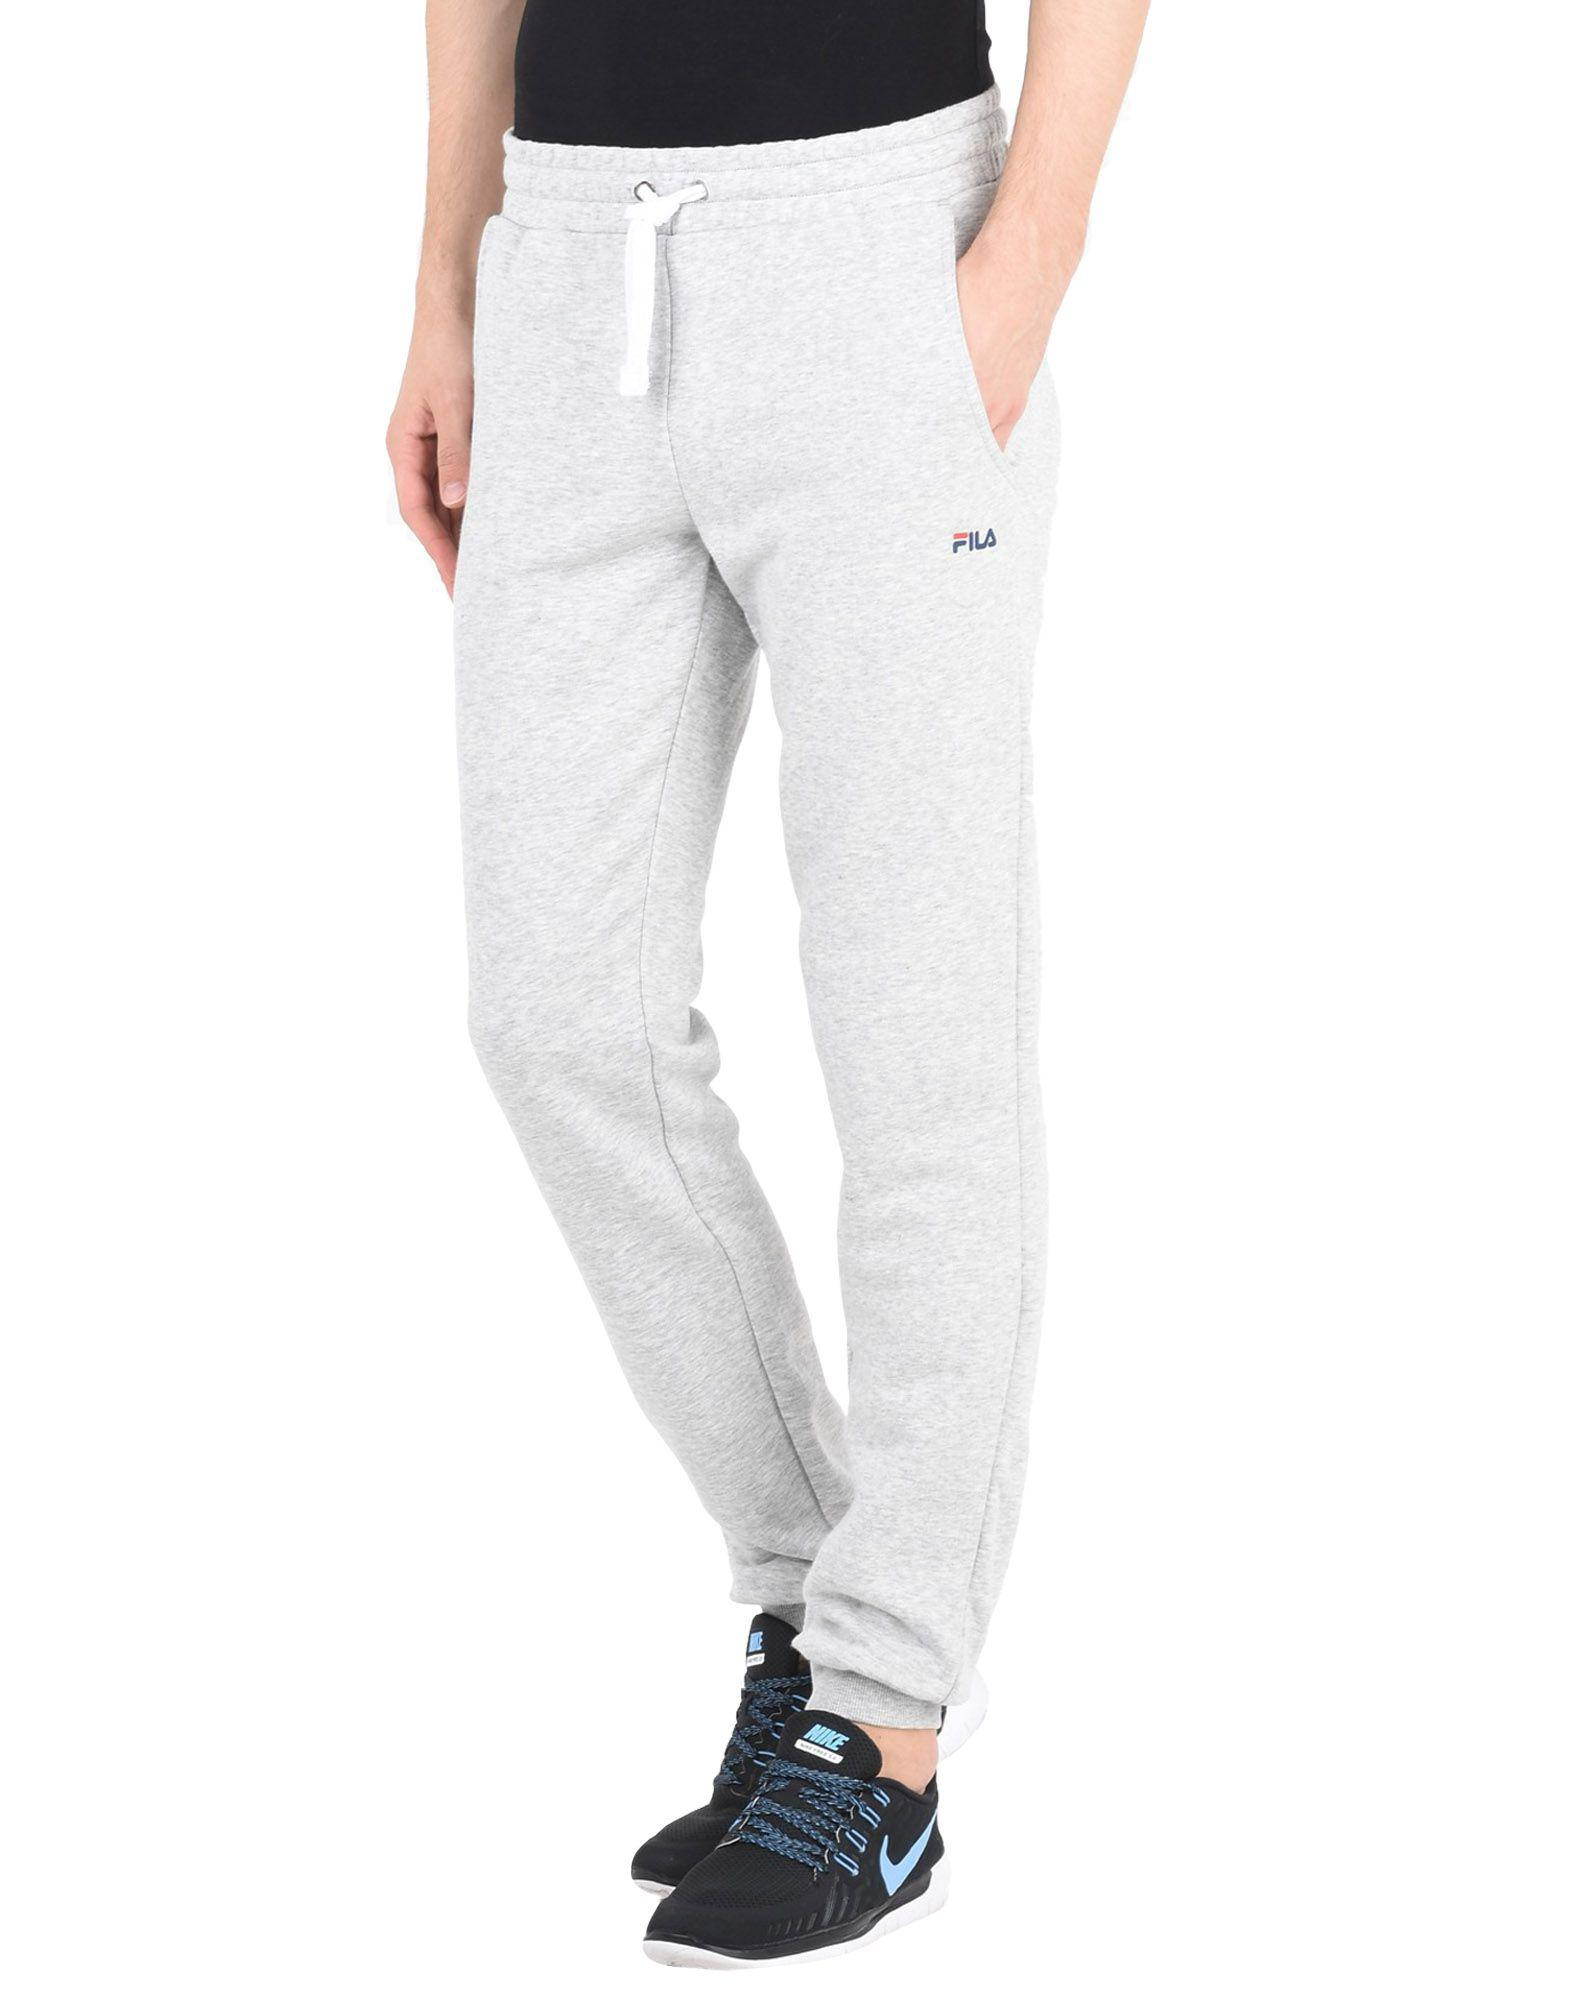 Pantalon - Pantalon Décontracté Fila HPTPW